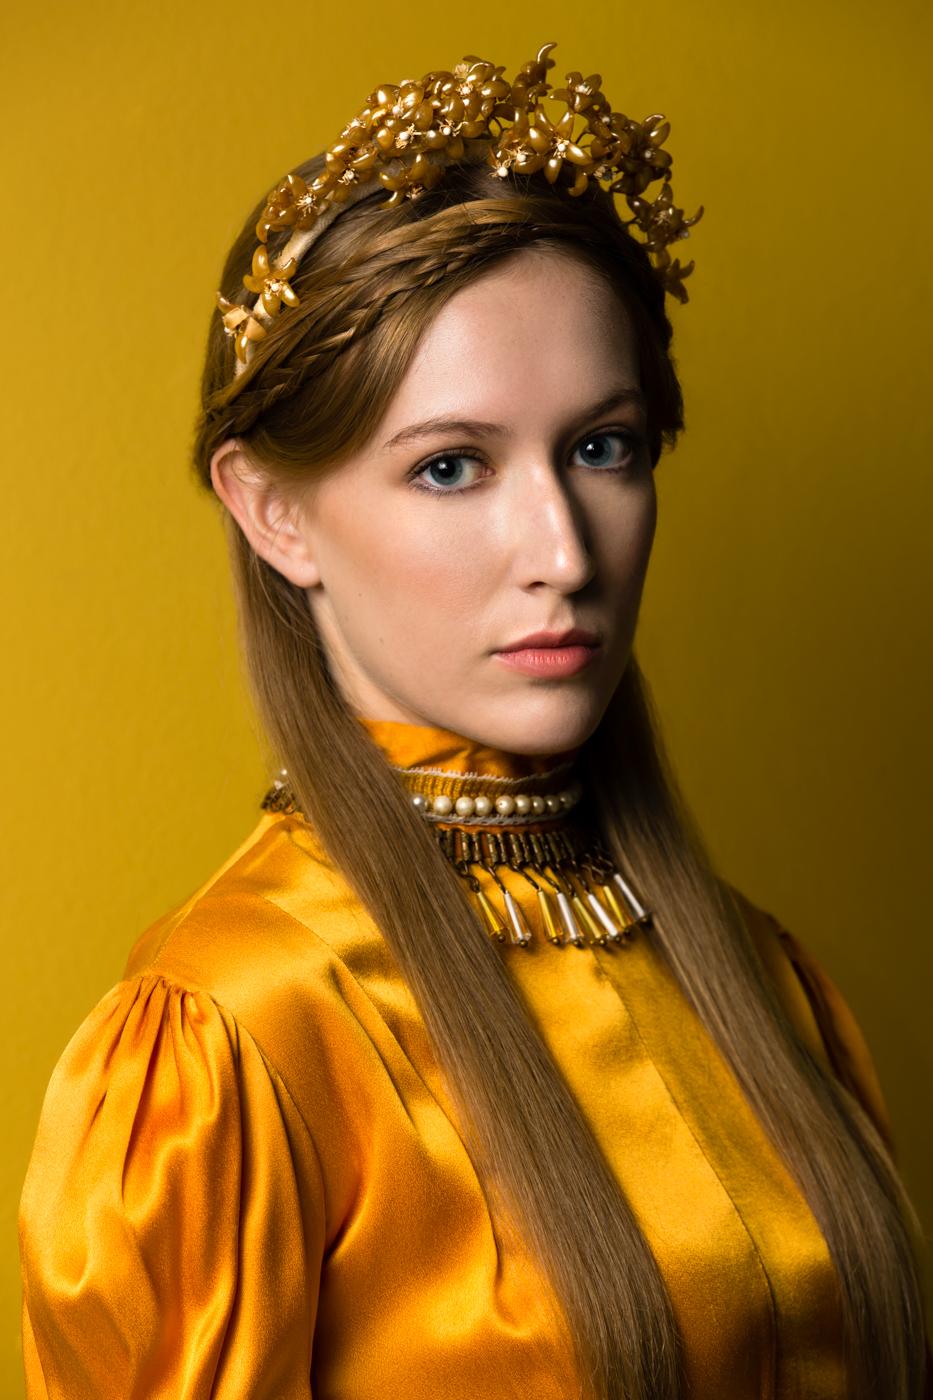 yellow-dress-flower-crown-woman-orlando-studio.jpg